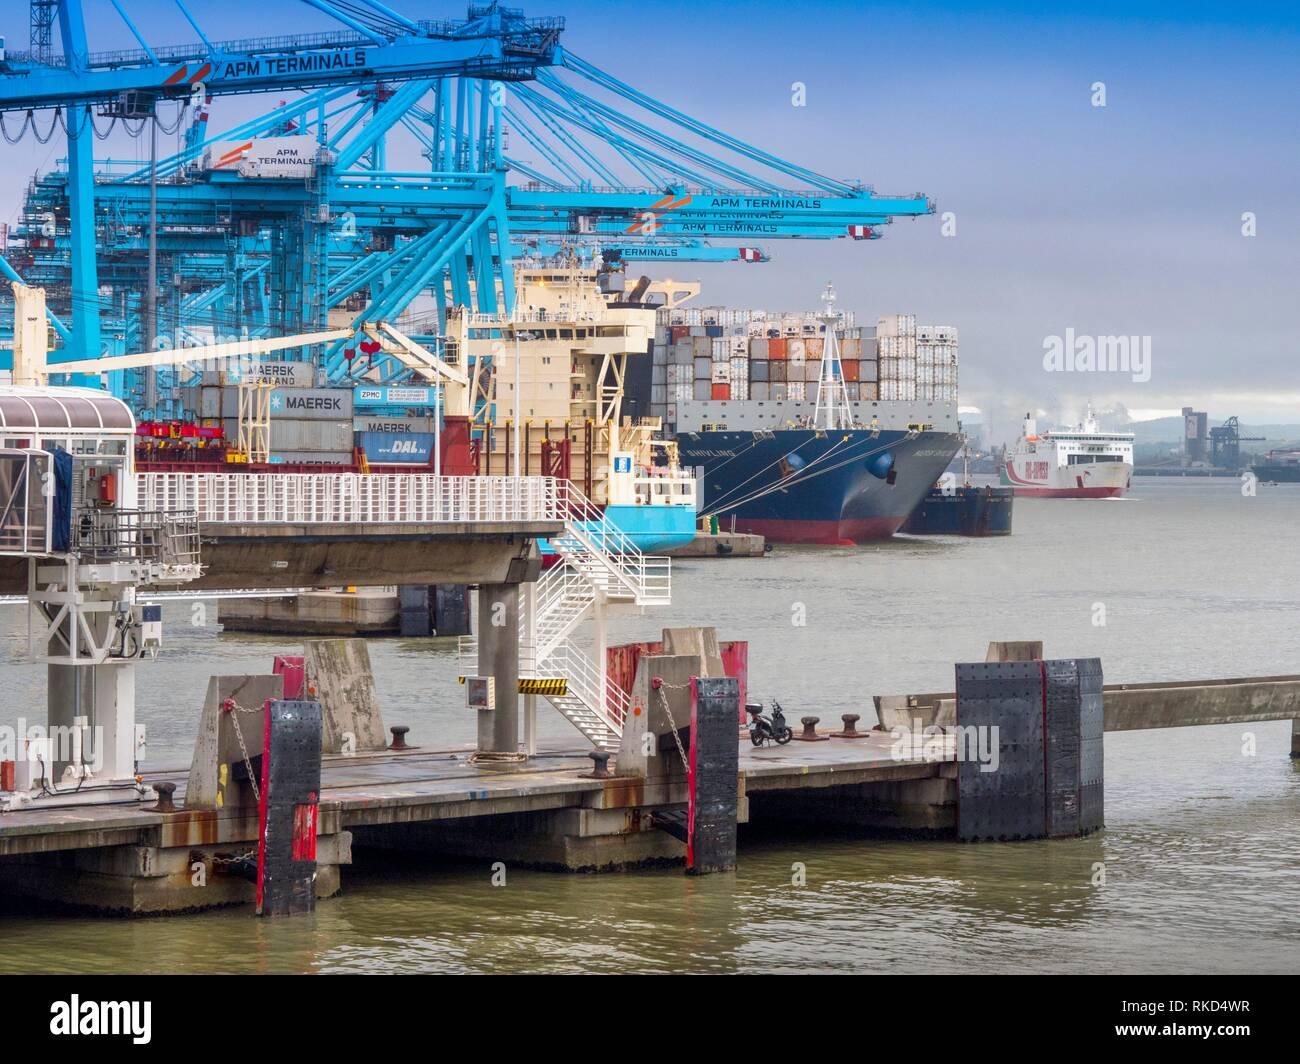 Spain, Andalusia, Cadiz province, Algeciras harbour, Containership - Stock Image